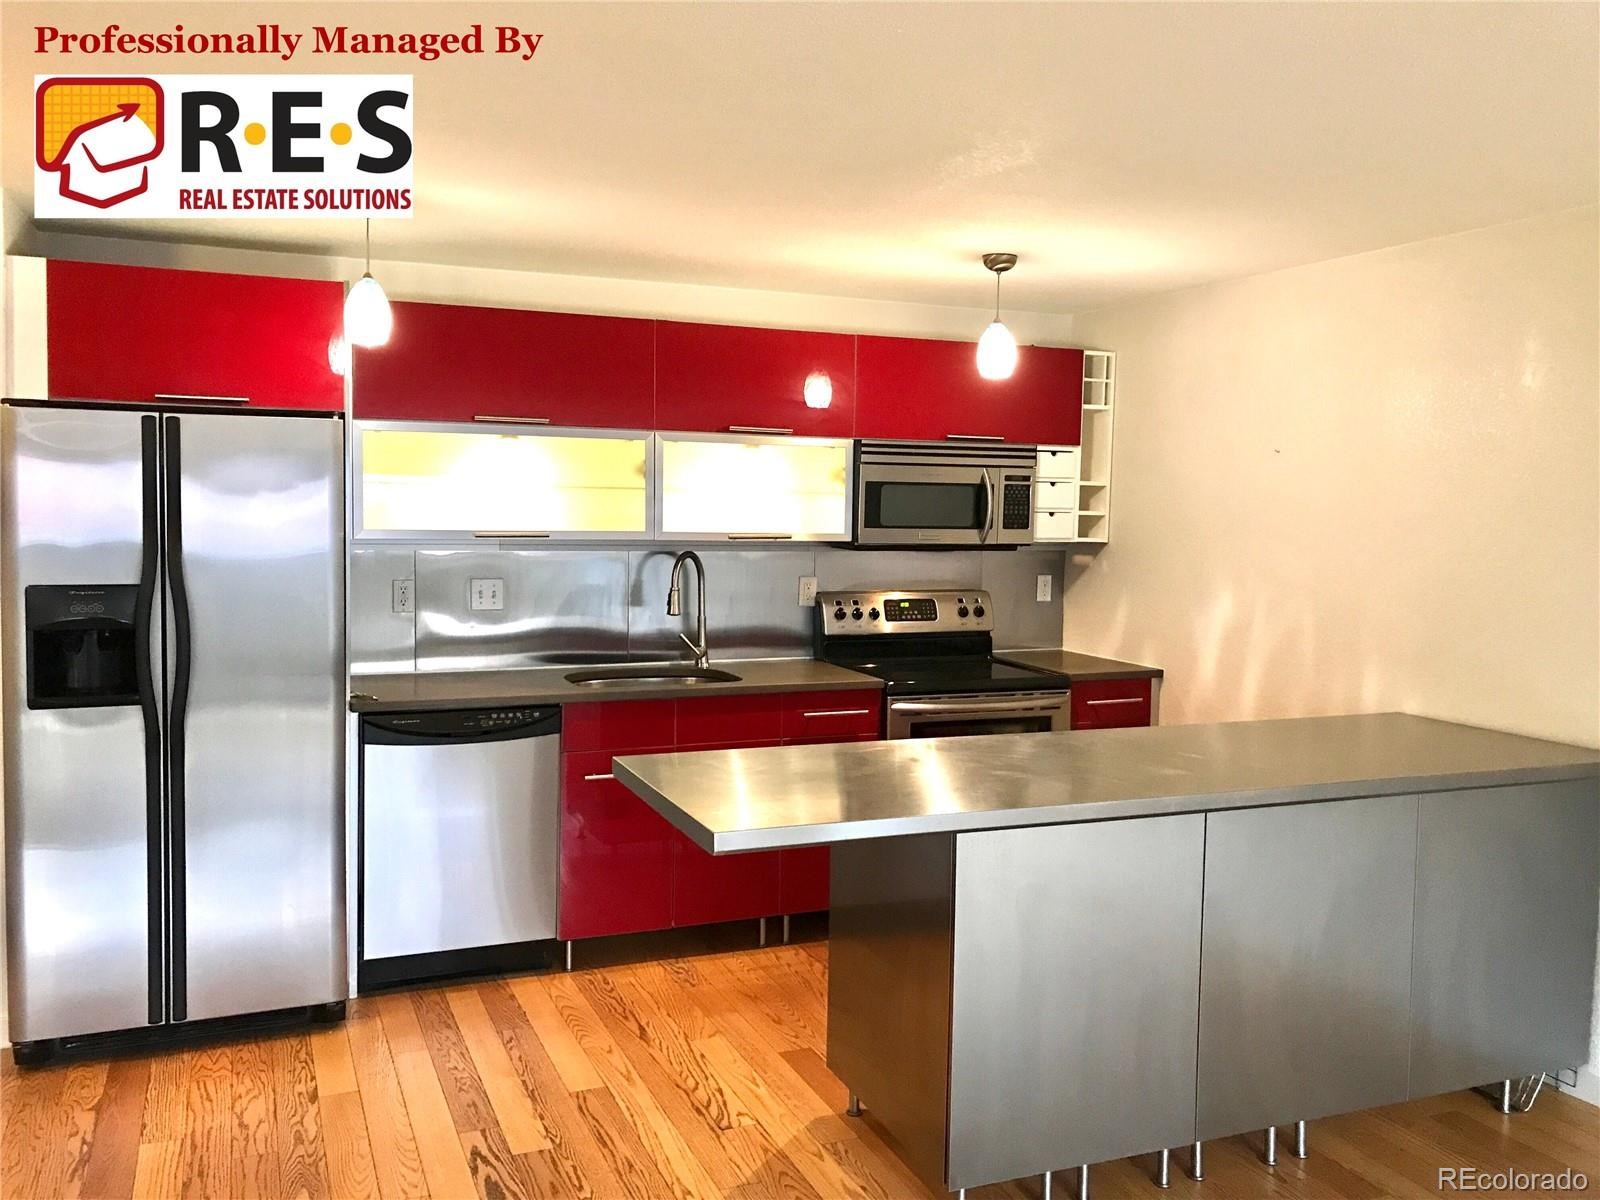 MLS# 9817838 - 5 - 75 N Emerson Street #103, Denver, CO 80218